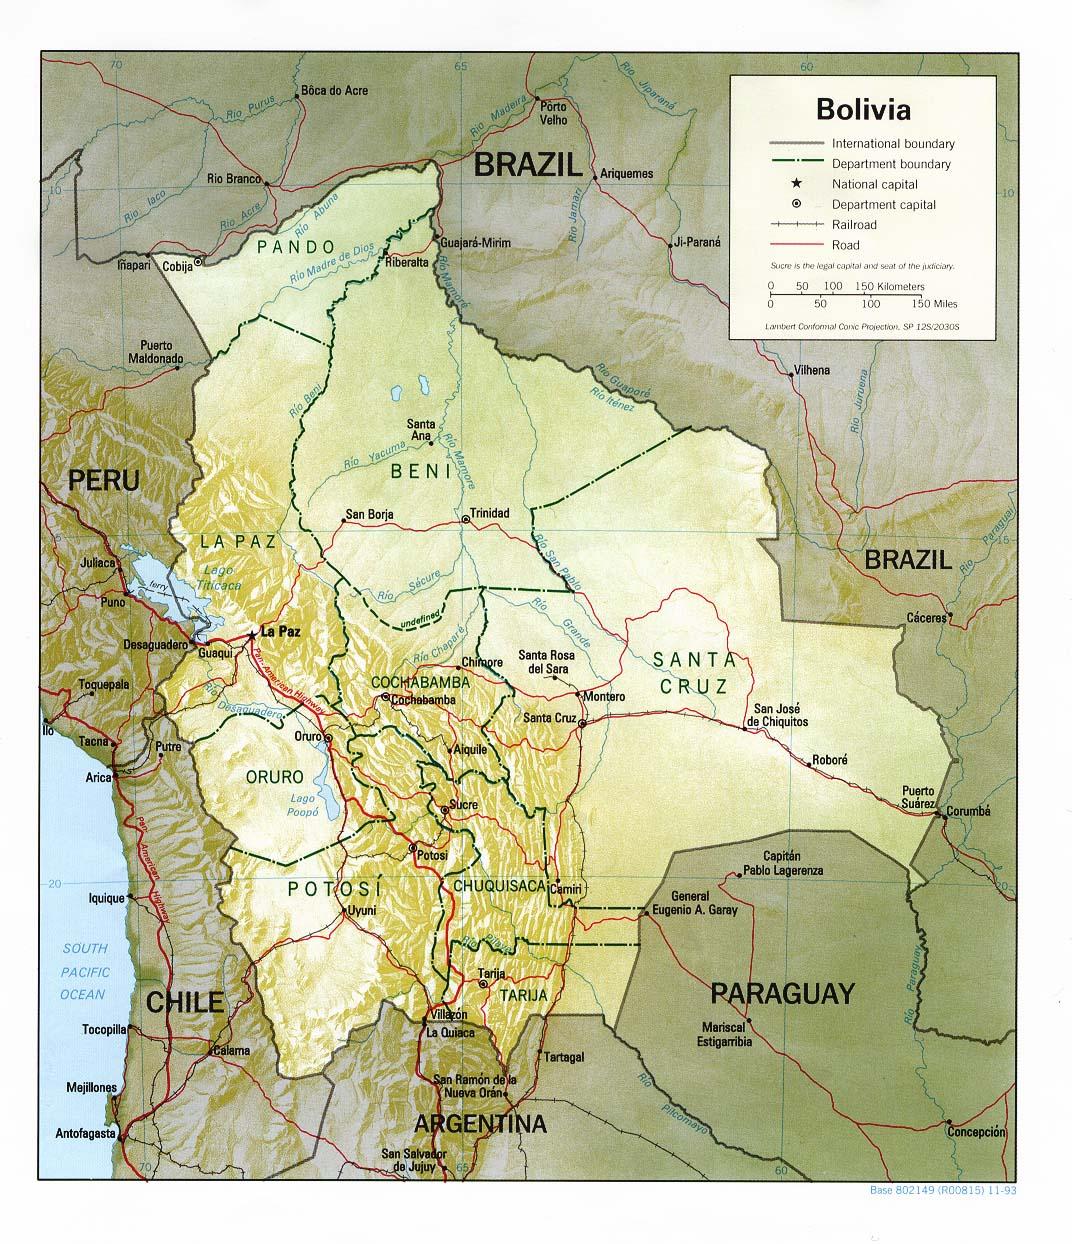 http://www.carte-du-monde.net/cartes/bolivie.jpg